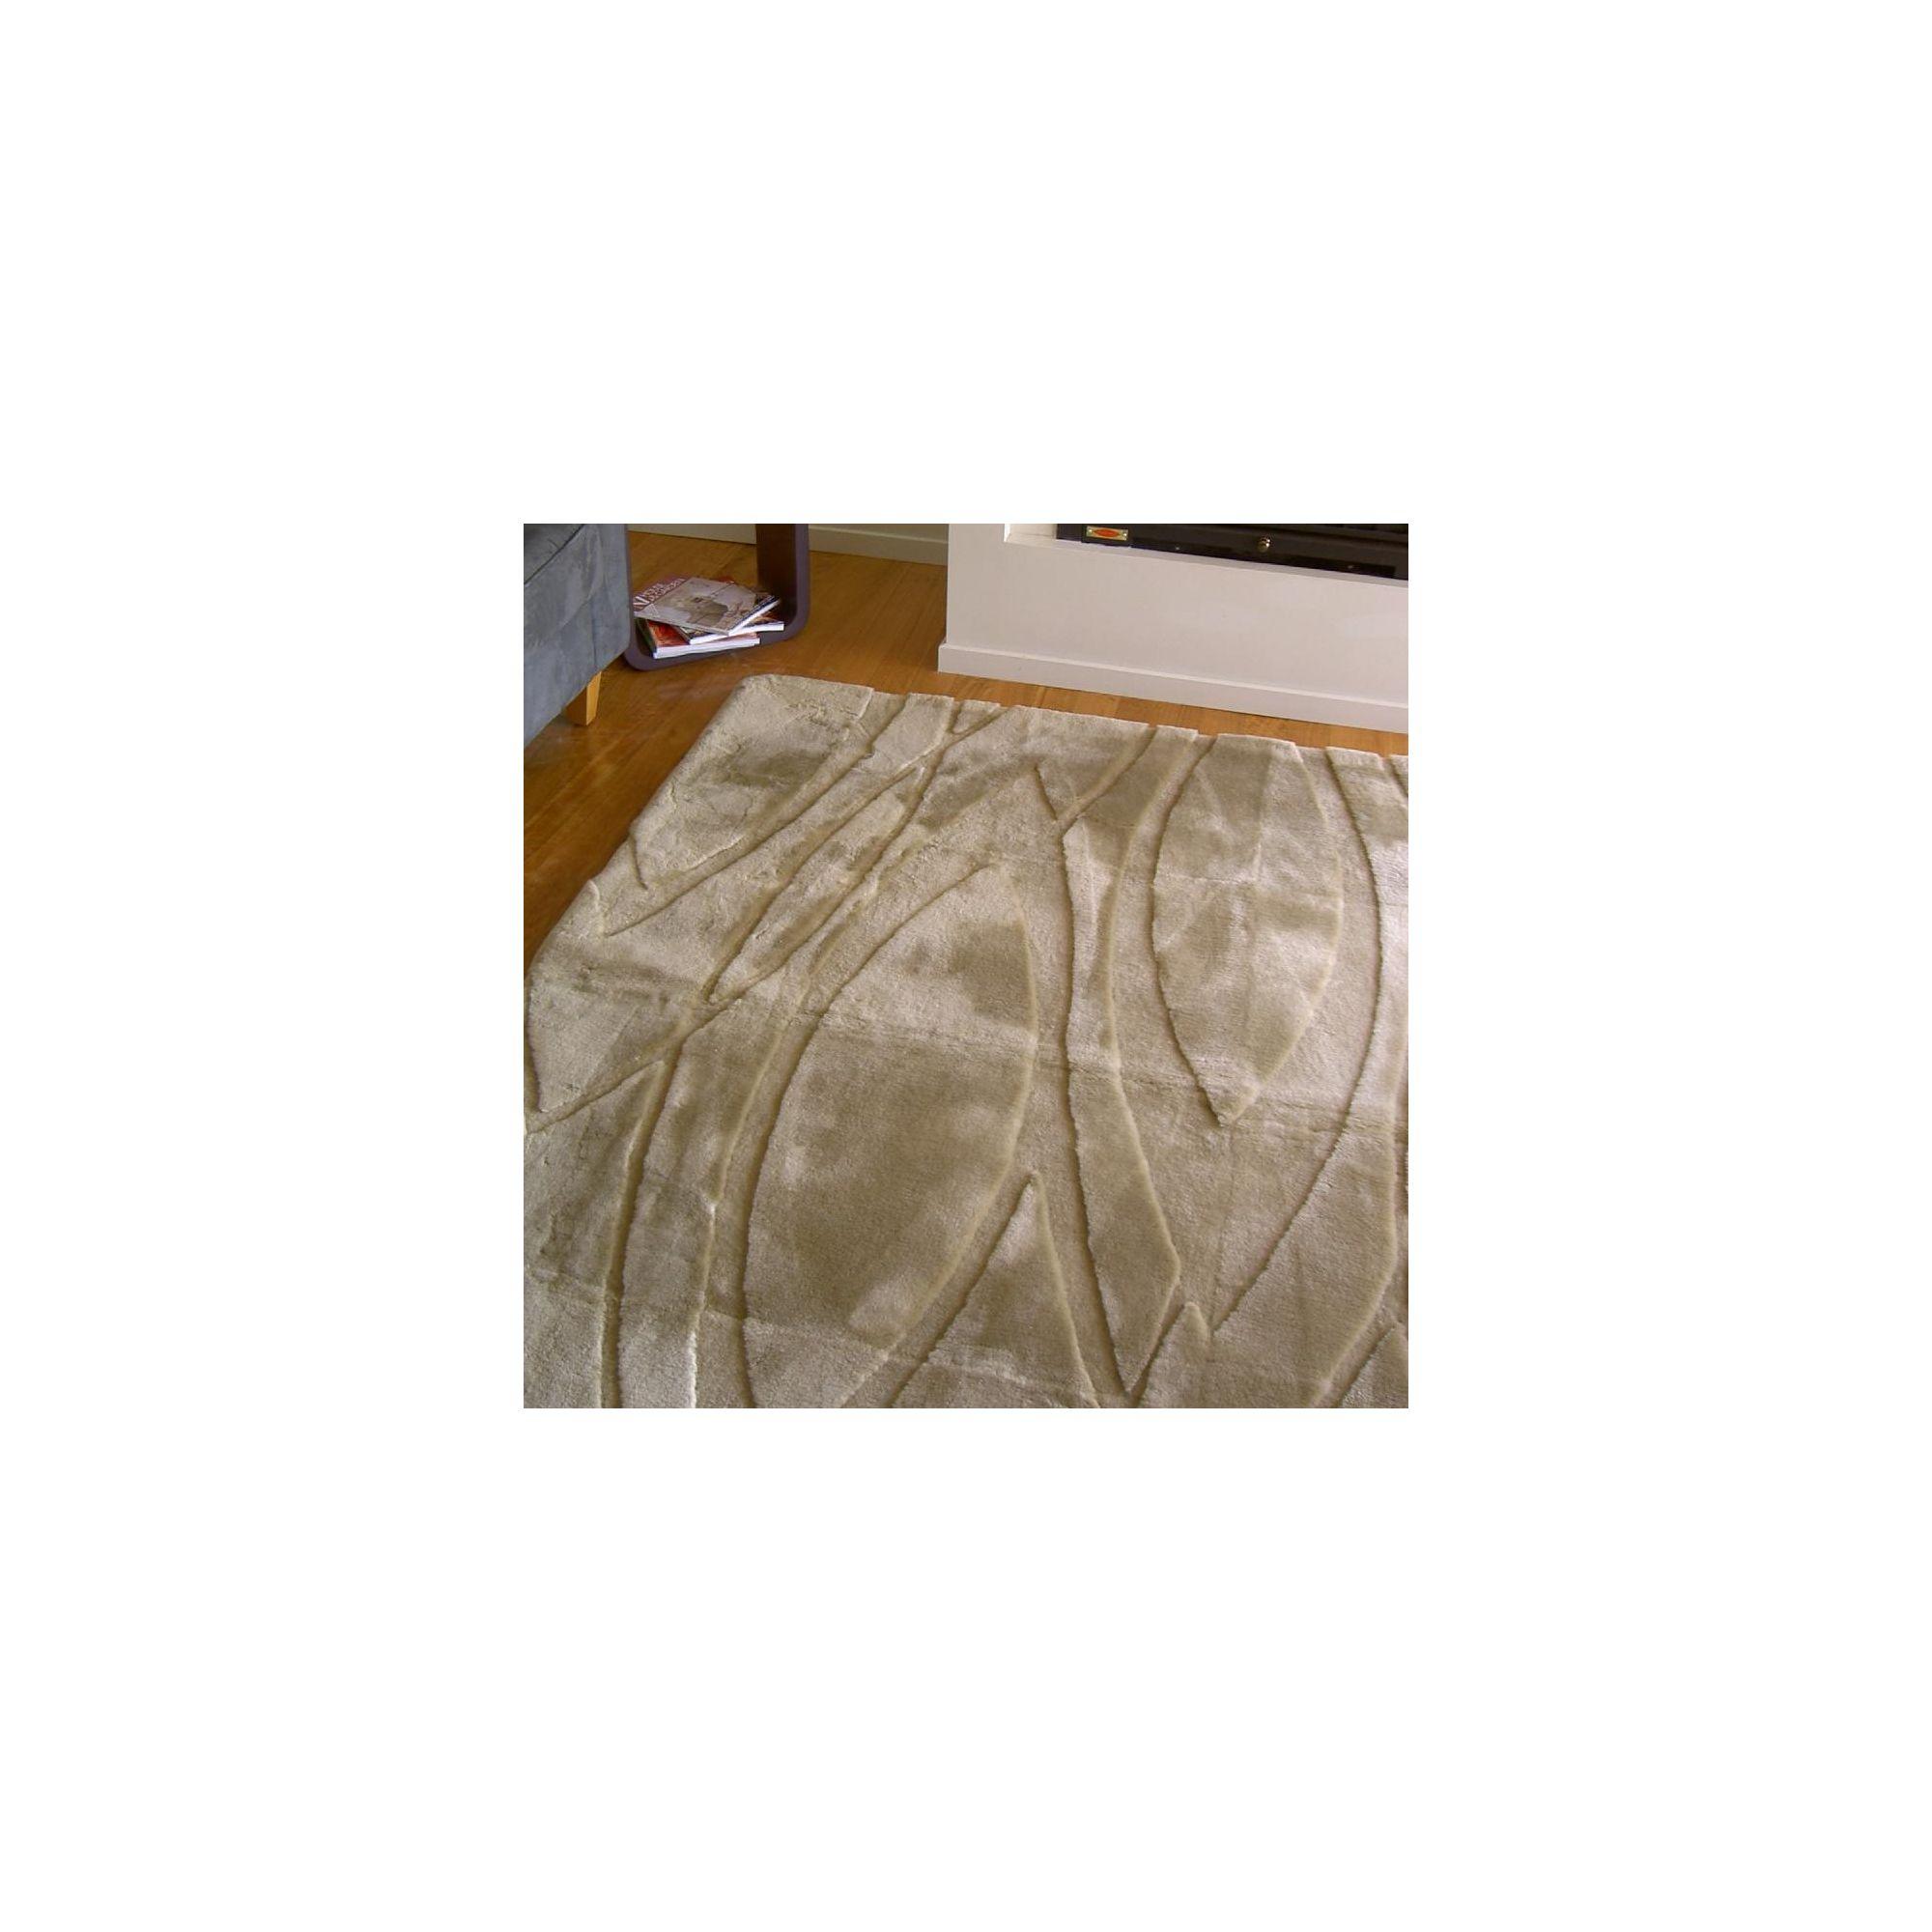 Bowron Sheepskin Shortwool Design Curves Rug - 350cm H x 250cm W x 1cm D at Tesco Direct